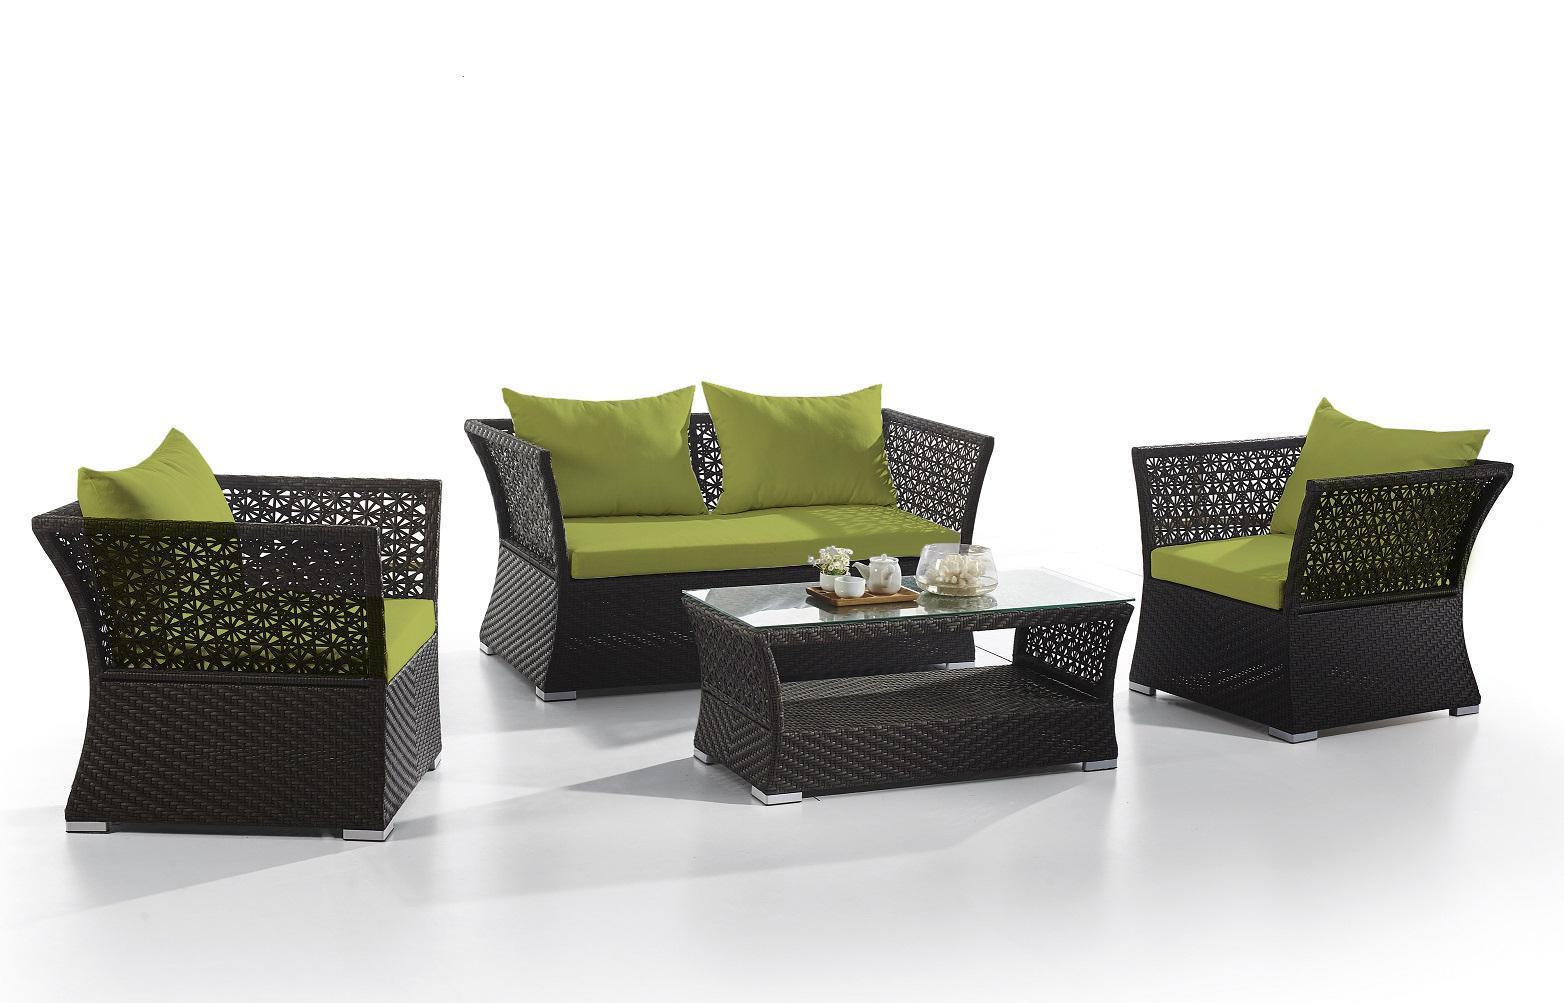 Лаунж-набор мебели Fiore